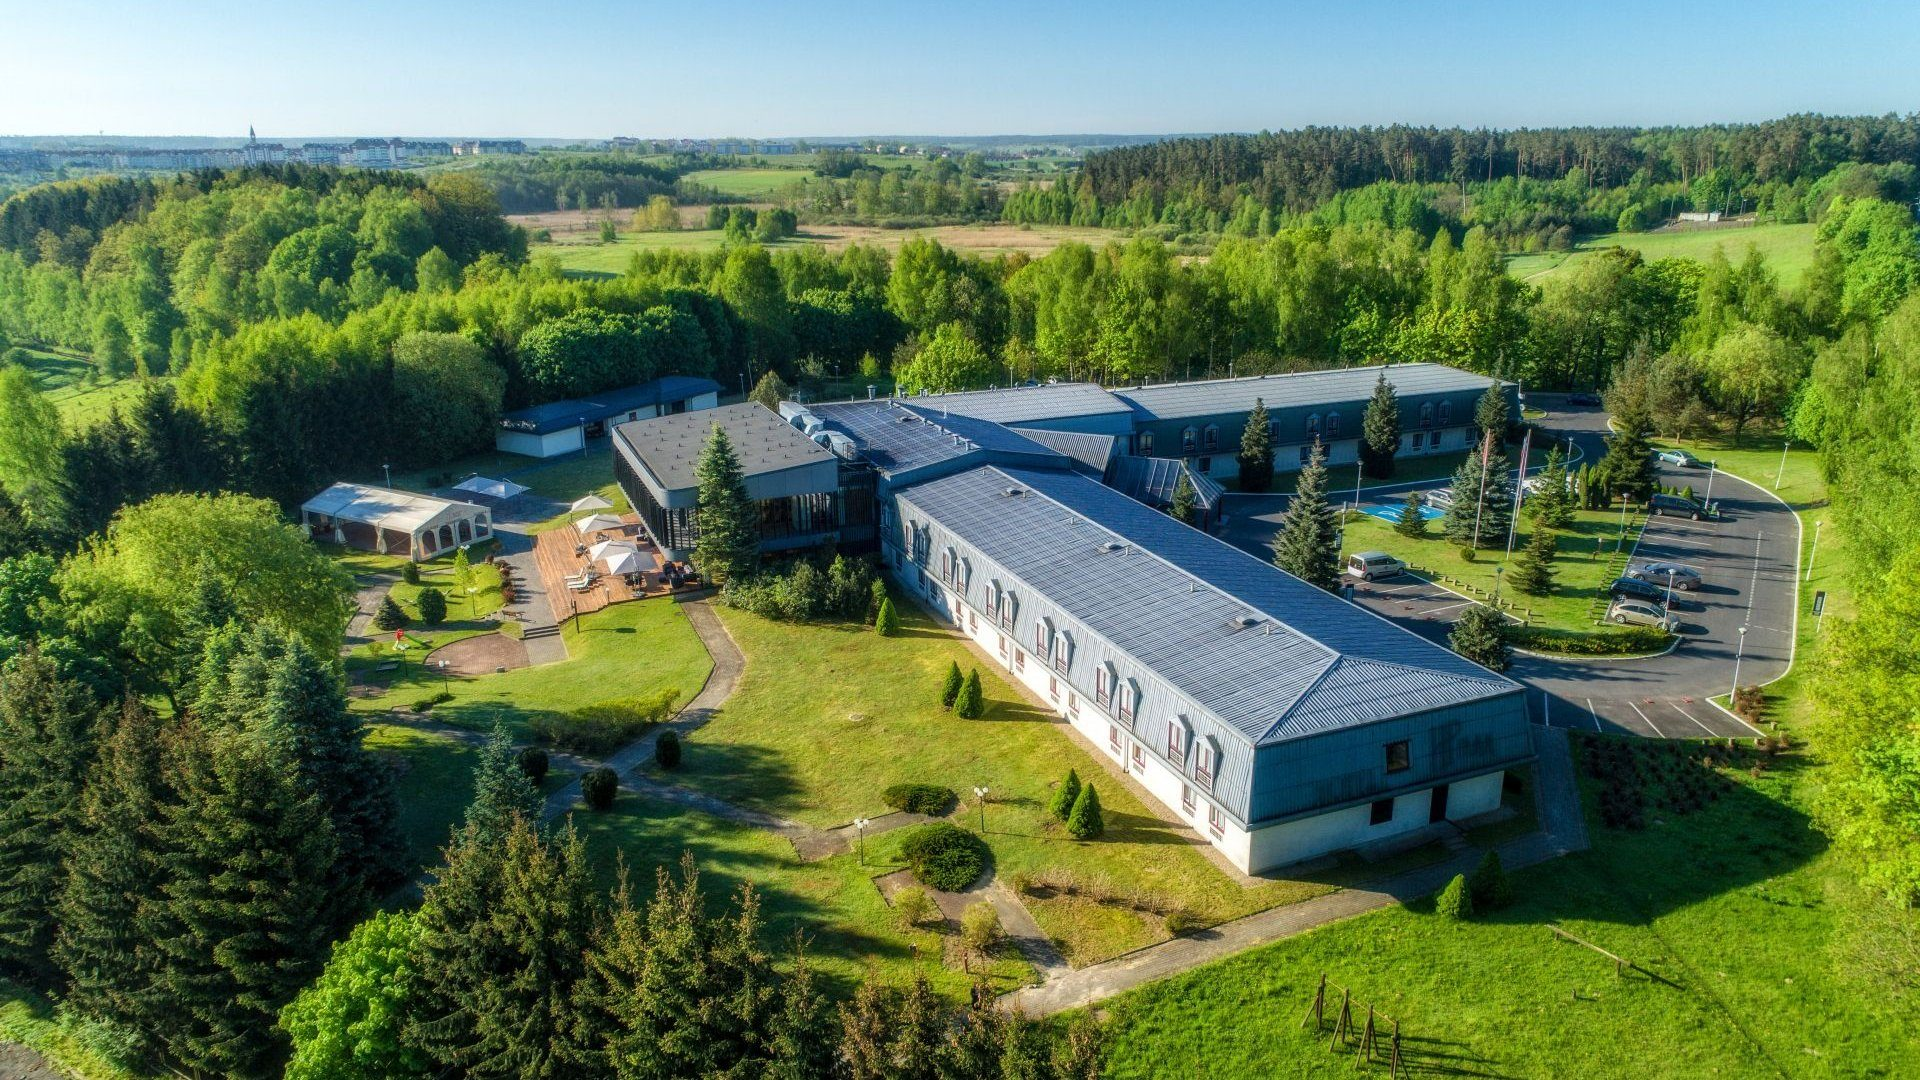 Startseite Hotel Hp Park Olsztyn